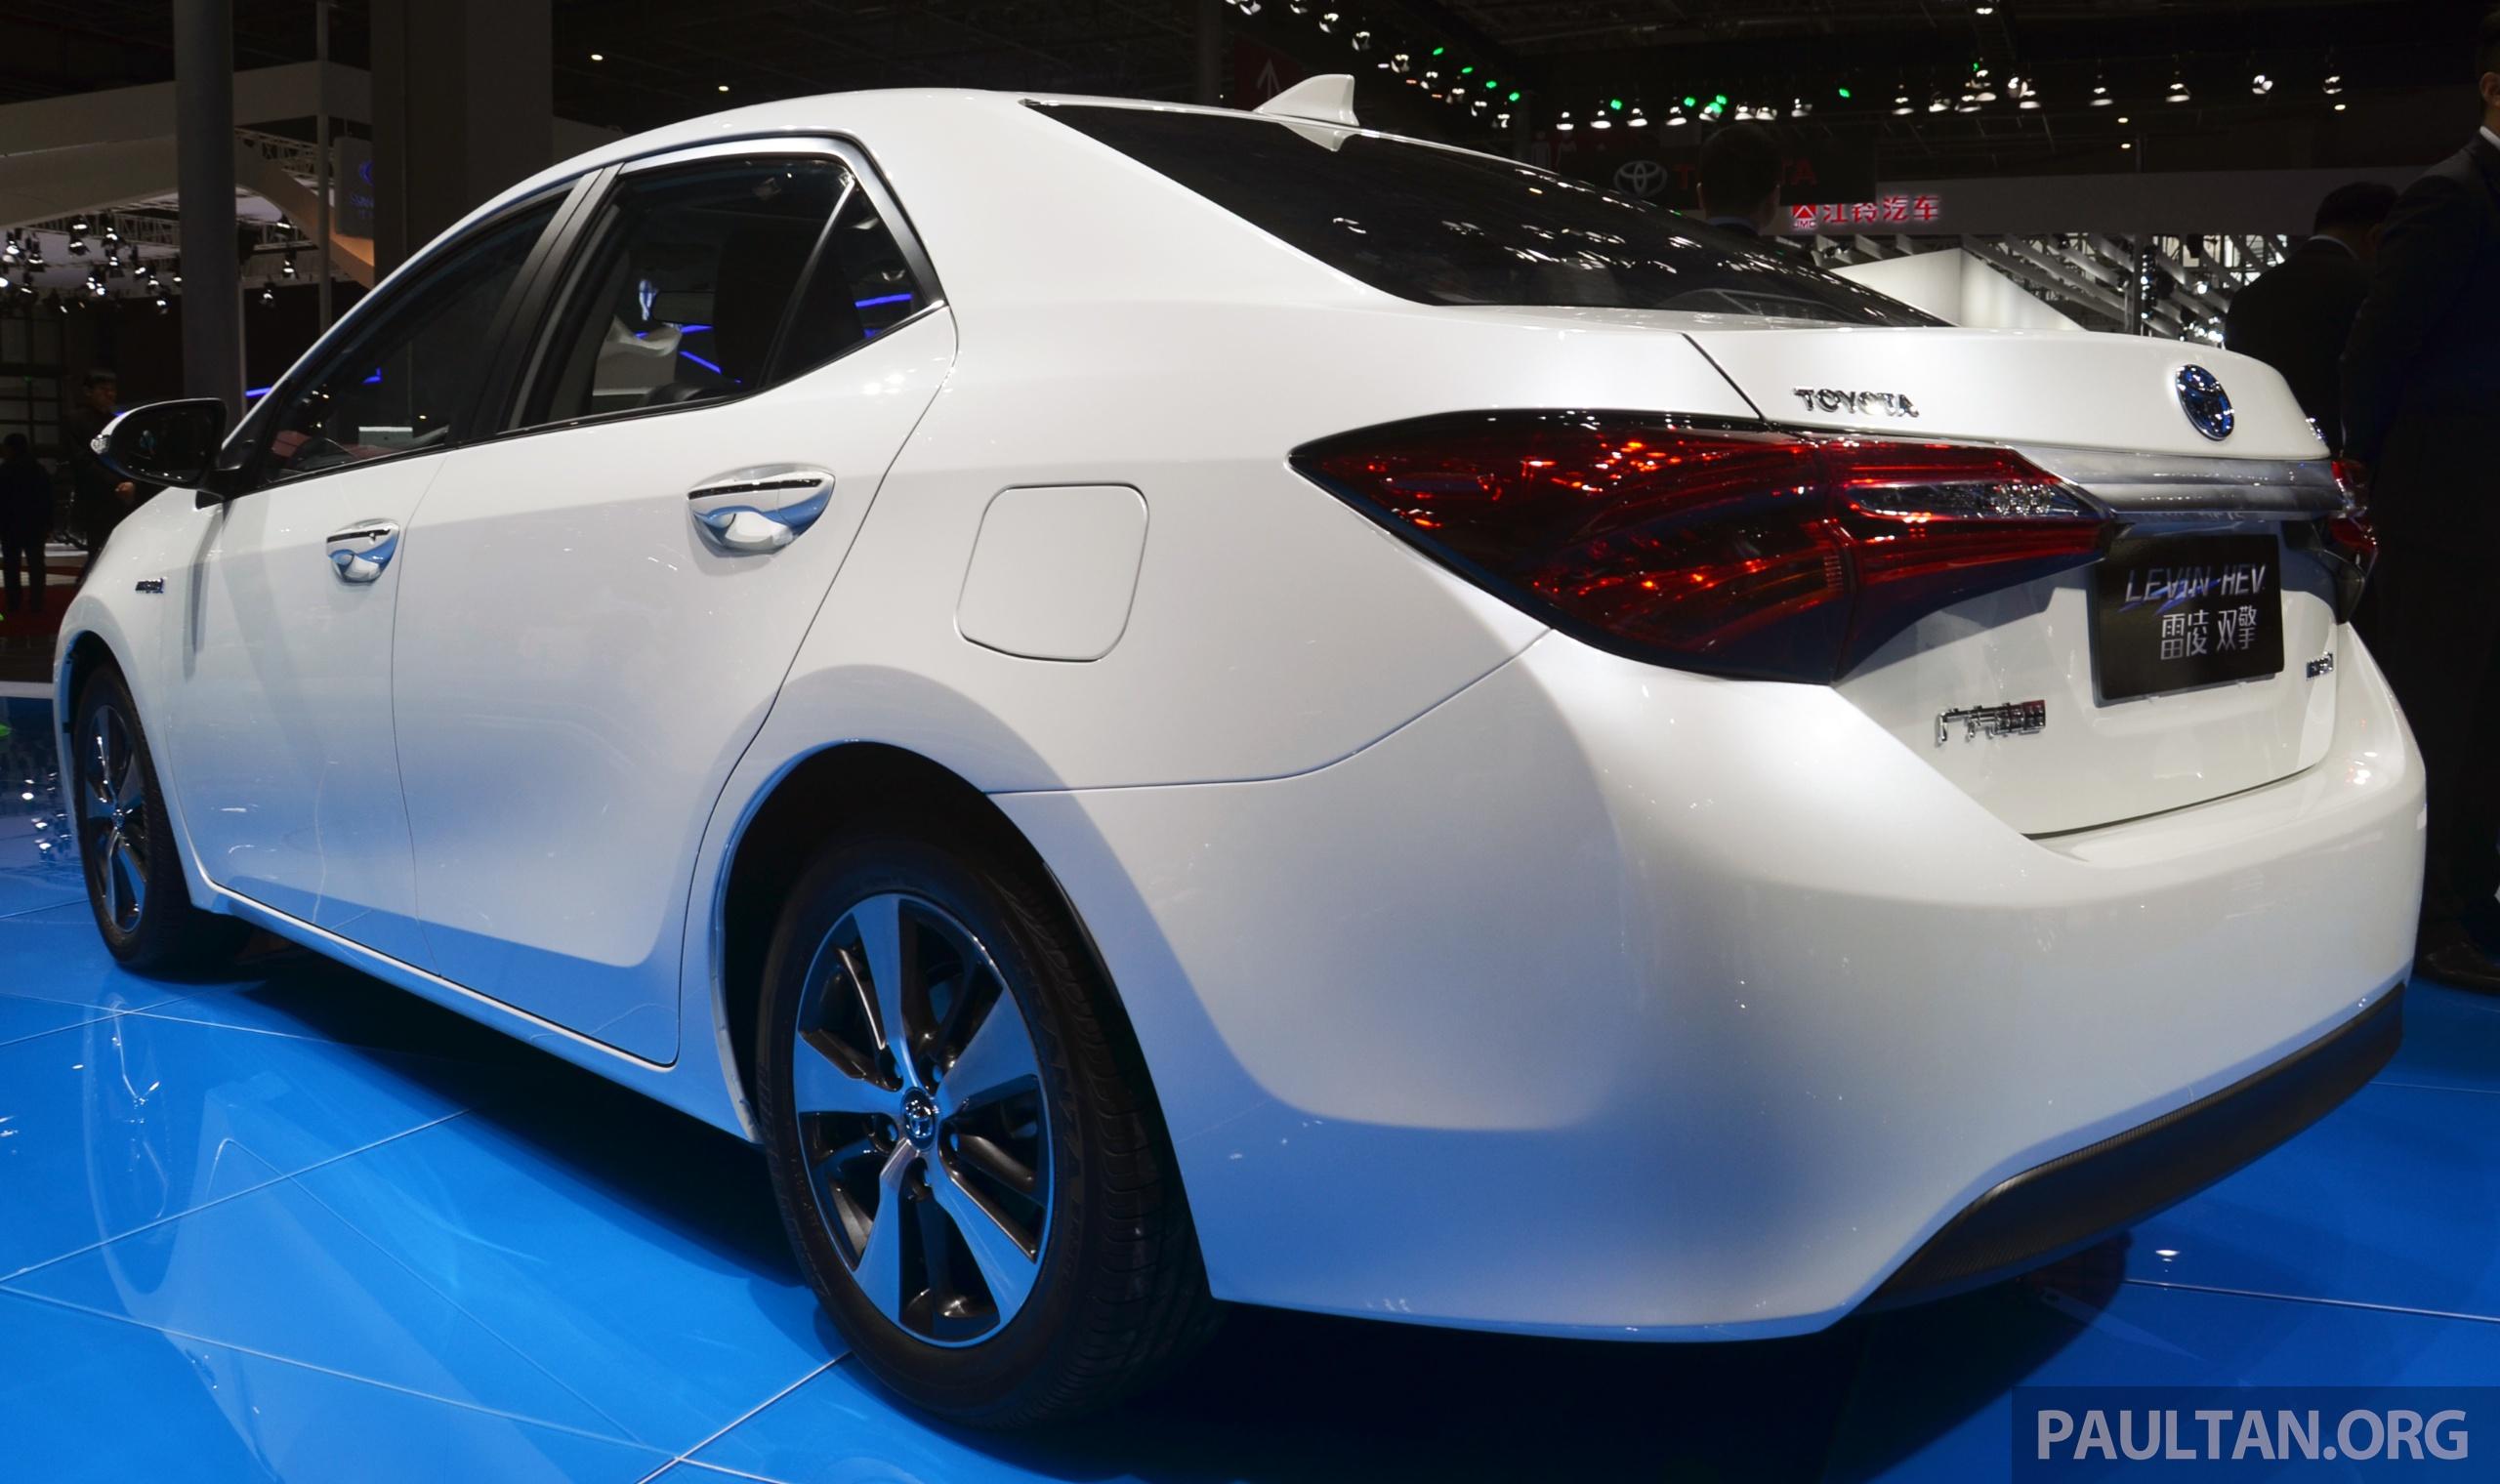 Shanghai 2015 Toyota Corolla Hybrid Levin Hev Debut Image